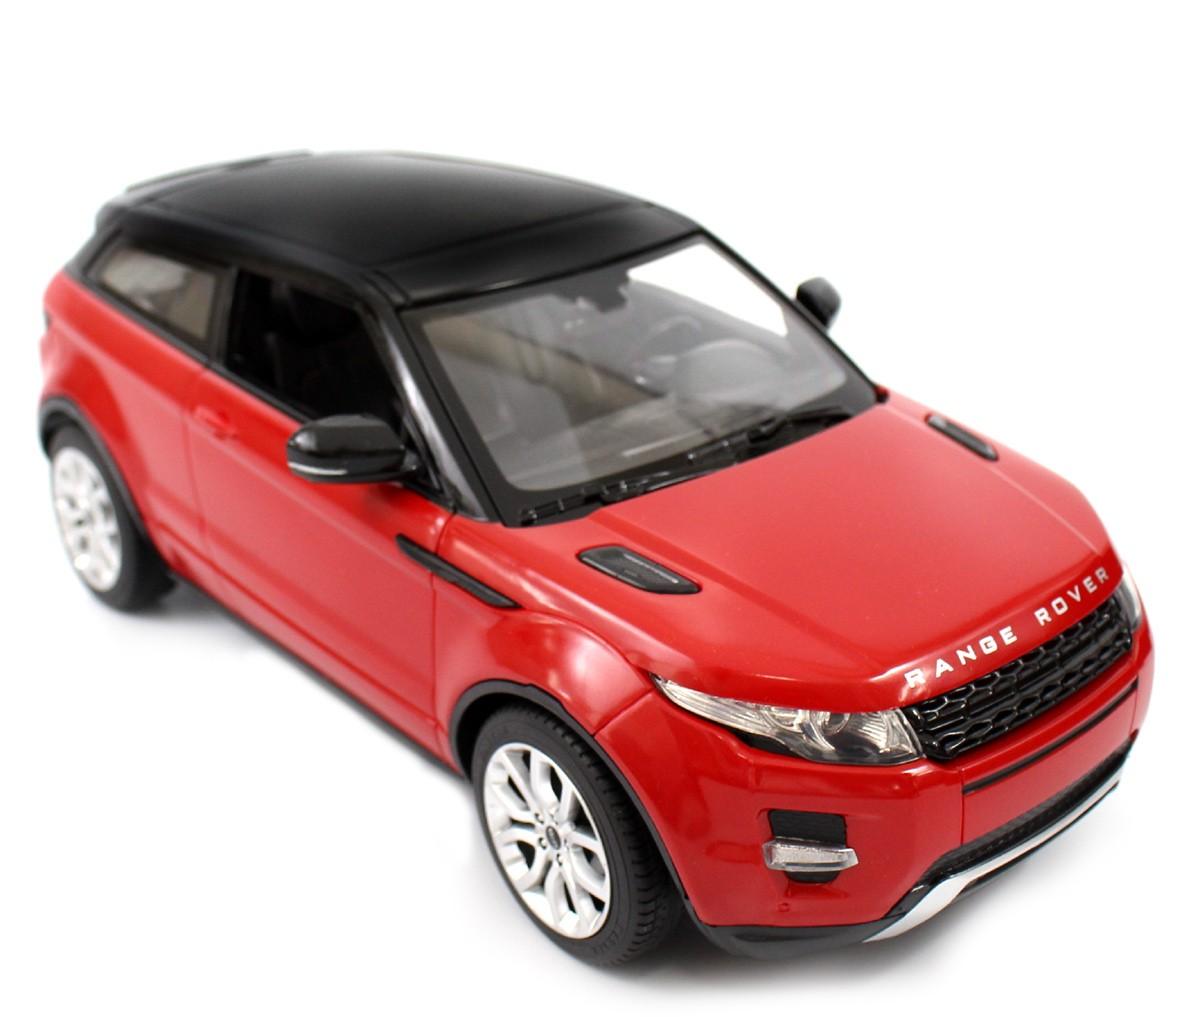 1:14 RC Range Rover Evoque (Red)